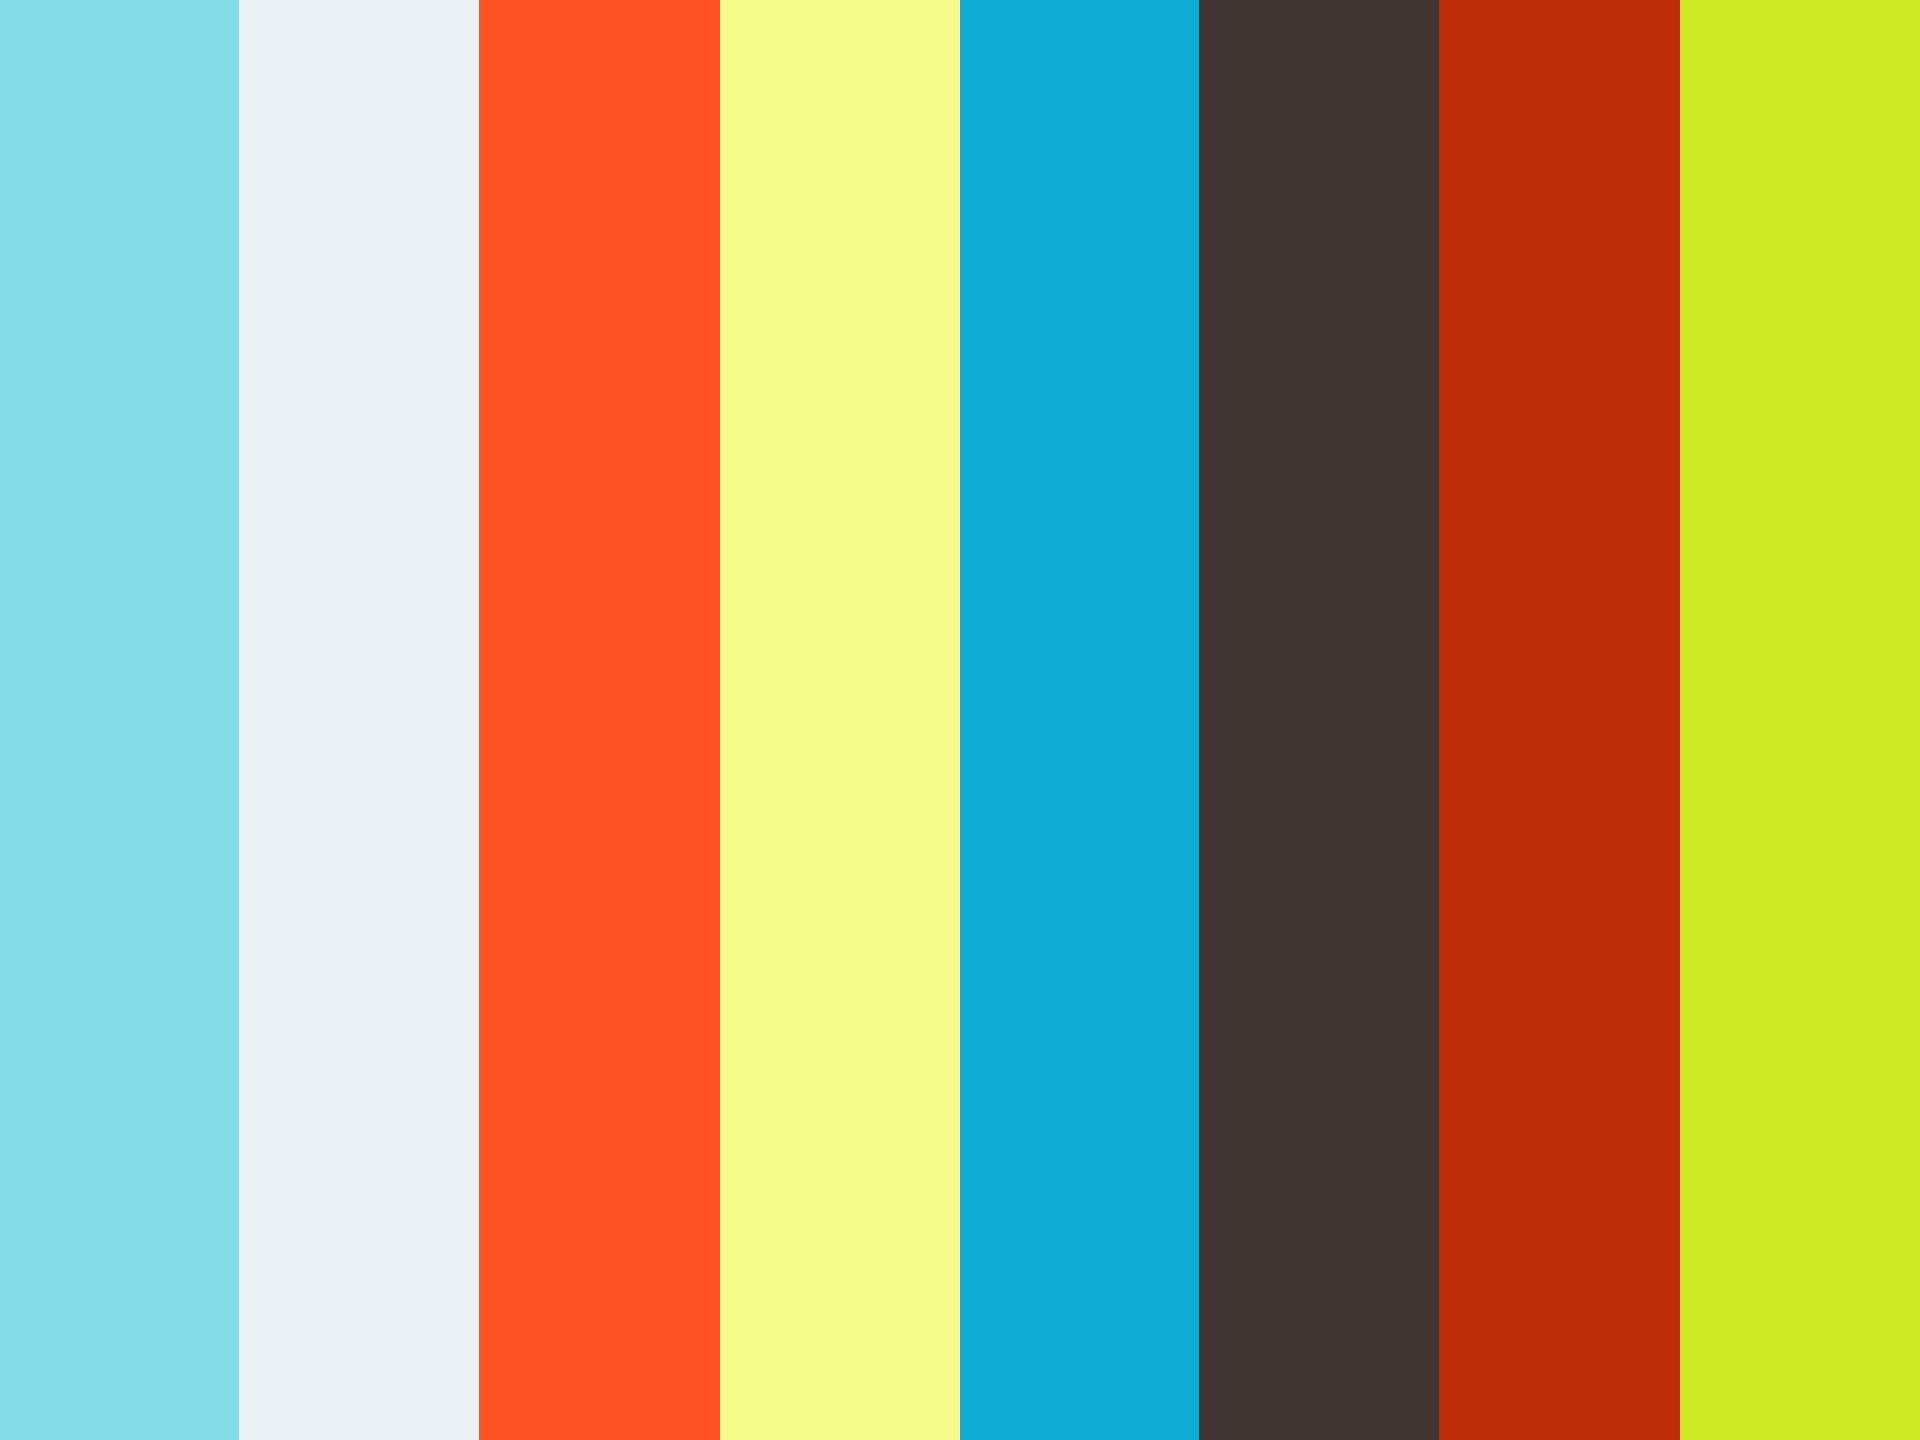 Color Space - sRGB. Adobe RGB. ProPhoto RGB and CMYK on Vimeo